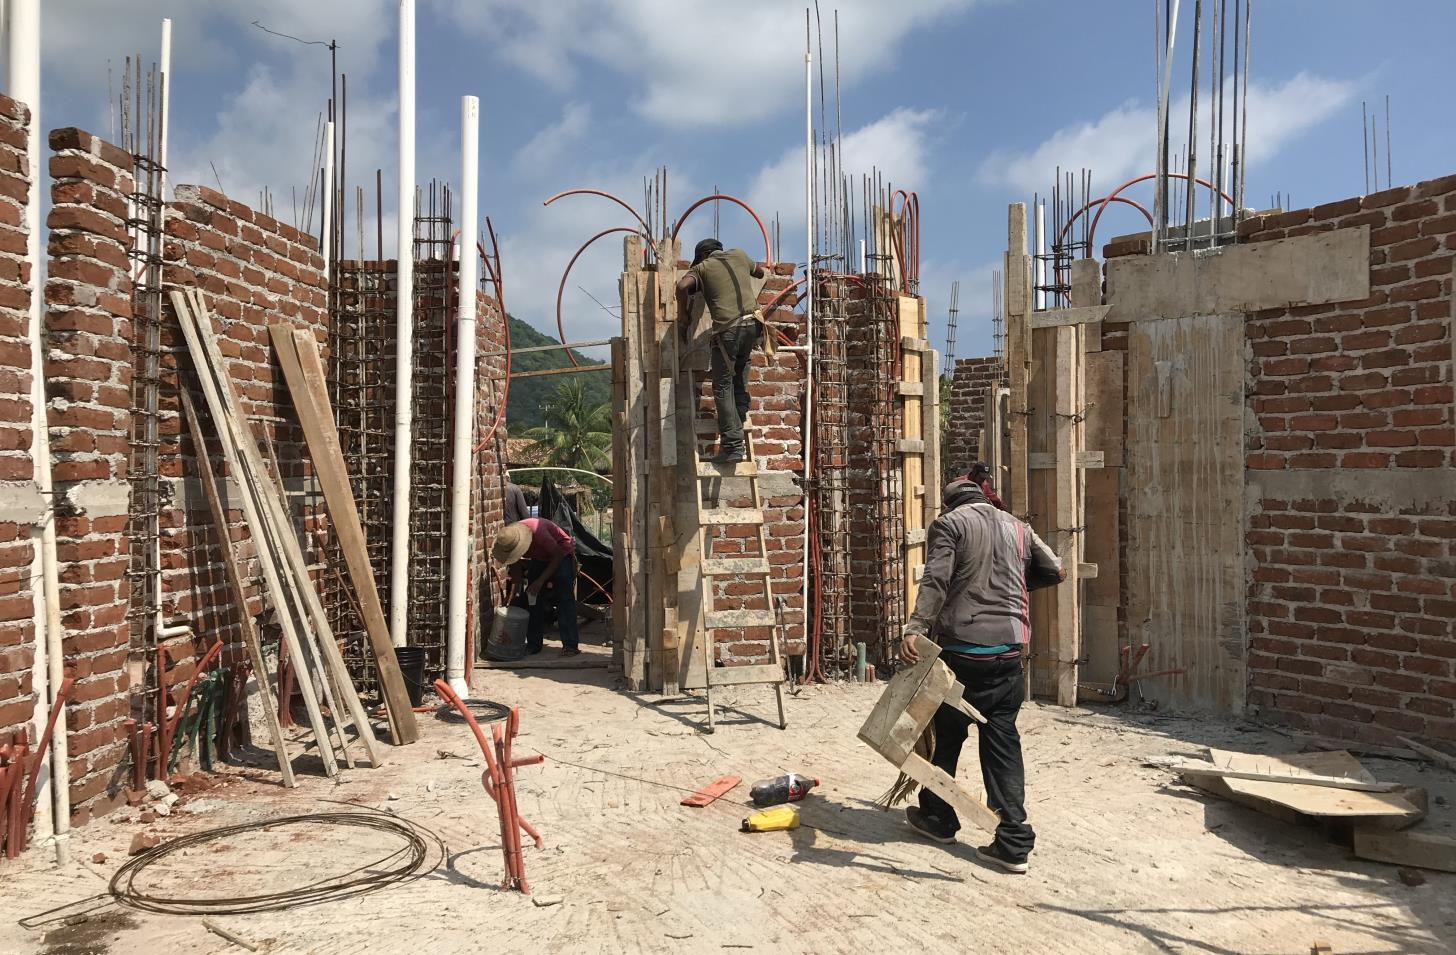 REPORTE-FOTOGRAFICO-PUNTA-MAJAHUA-12-DE-AGOSTO-DEL-2018-025.jpg